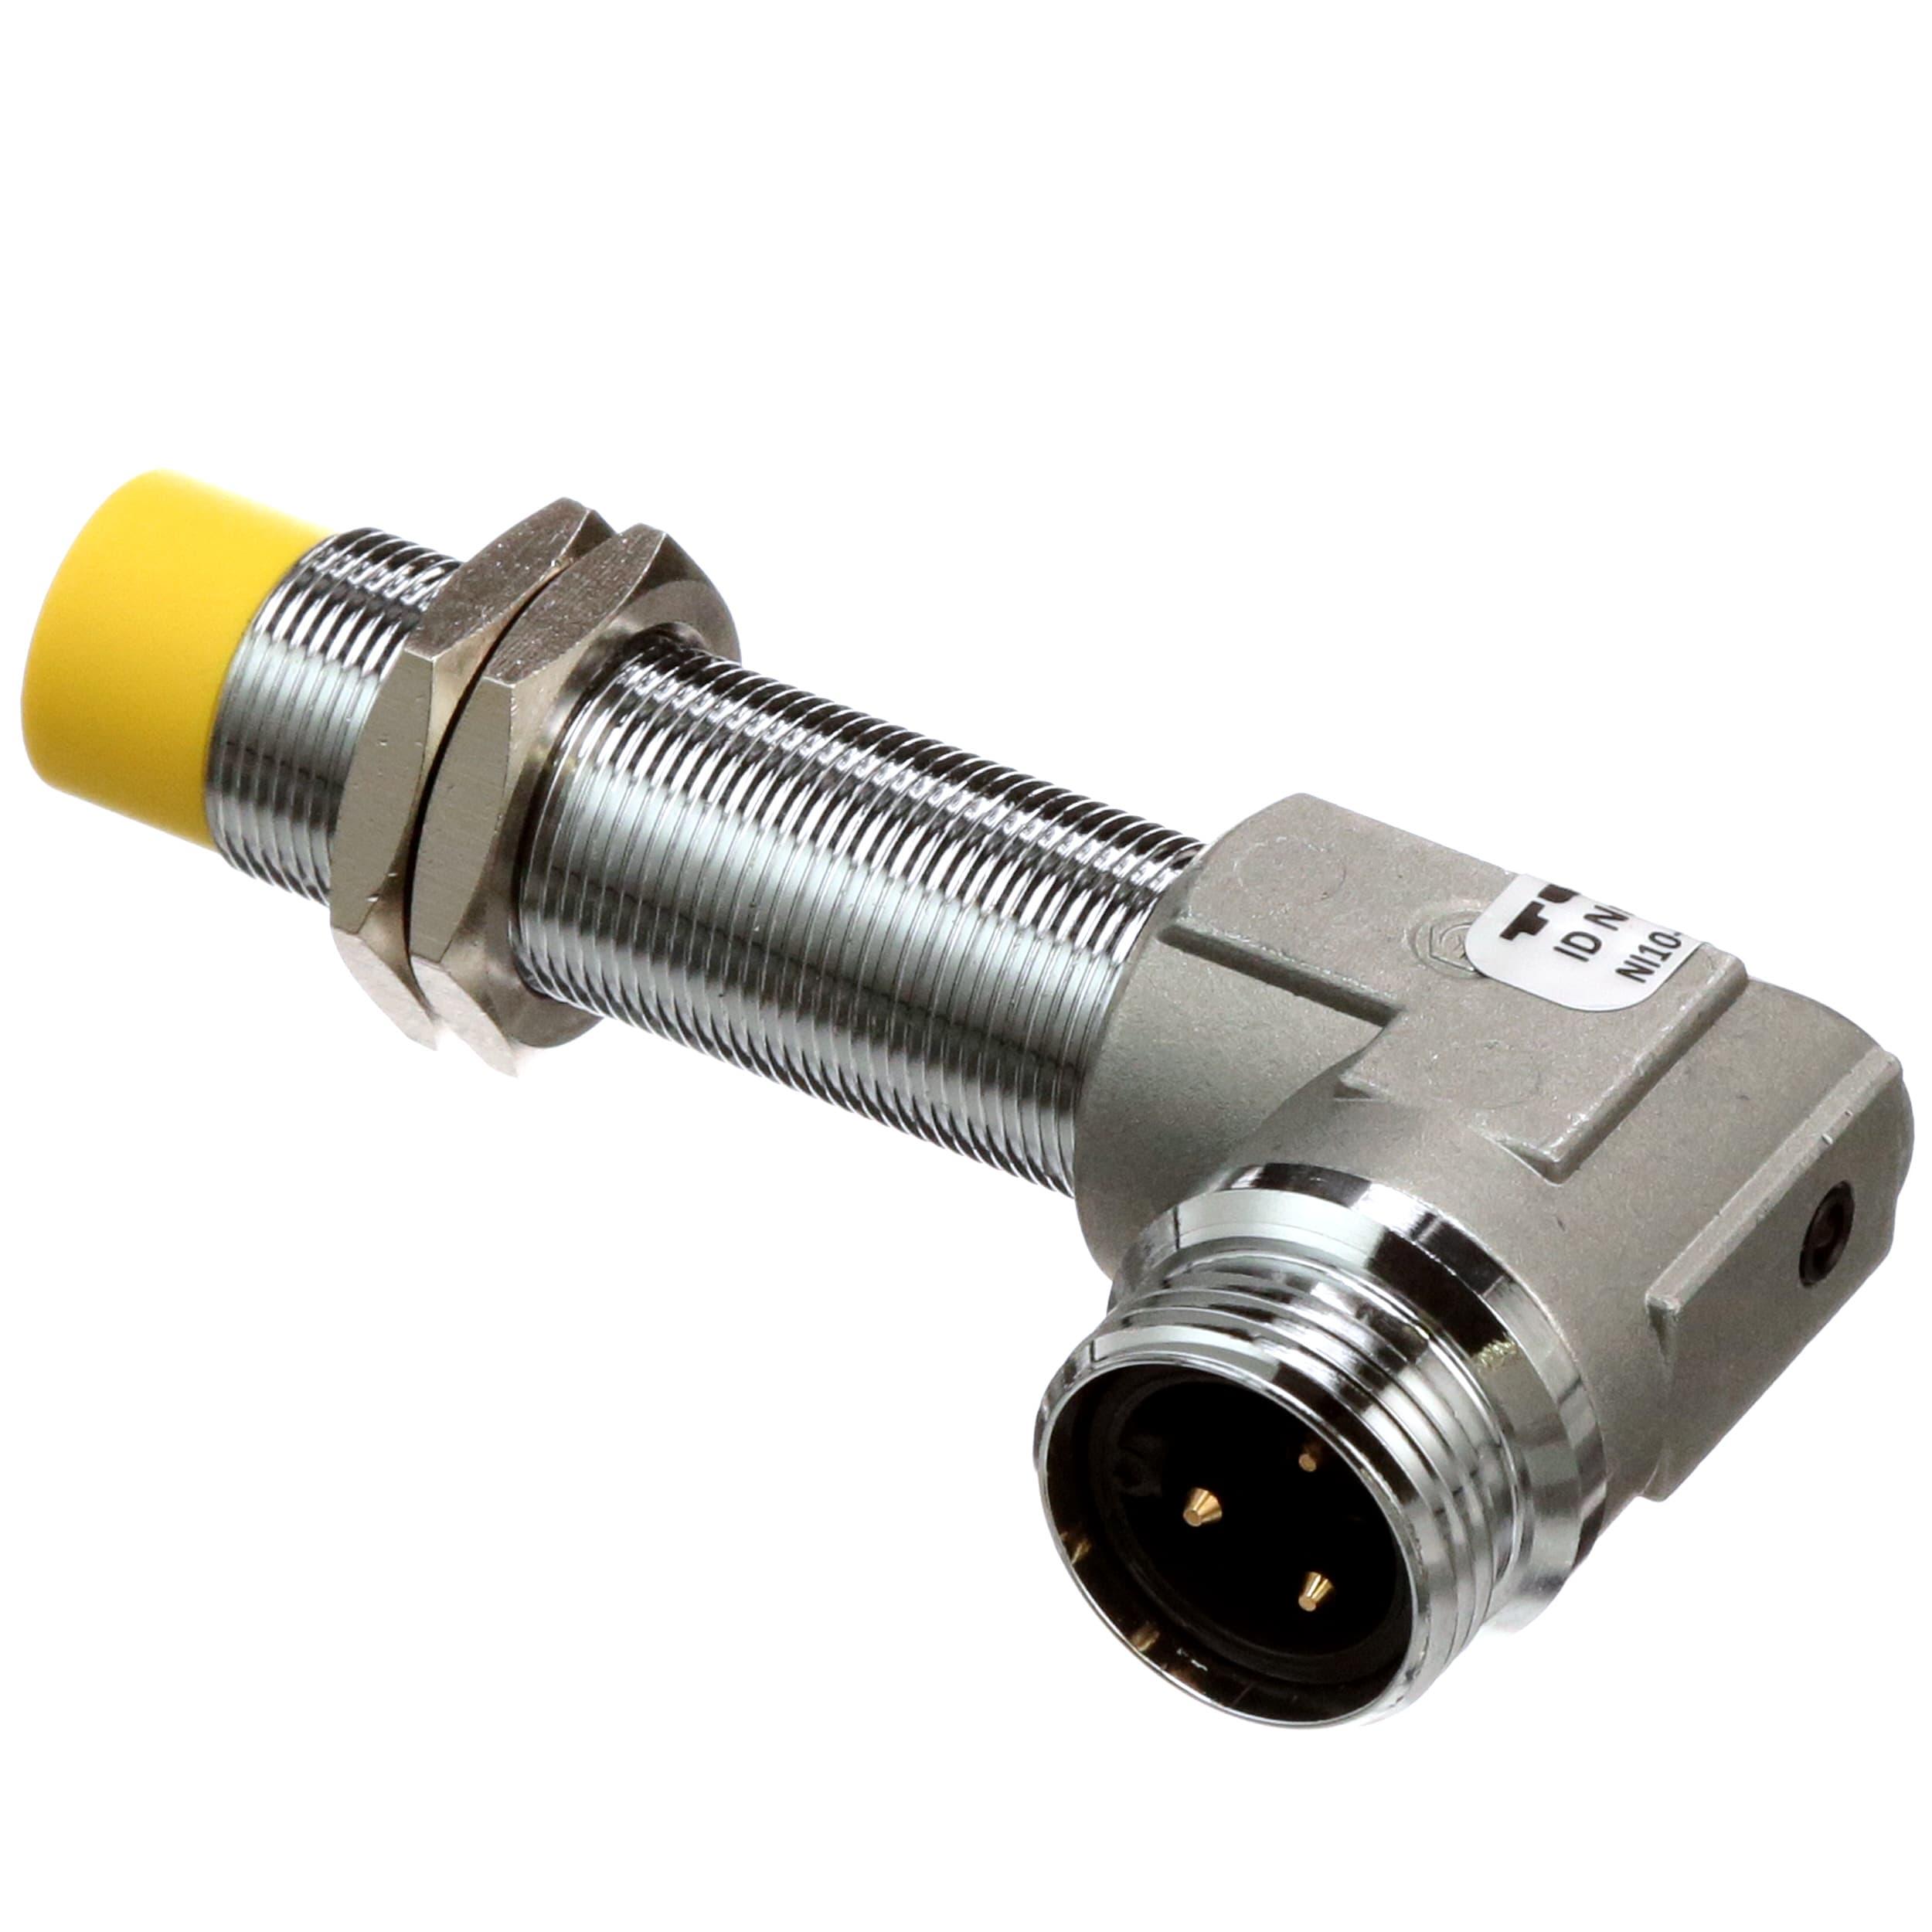 Turck Ni10-G18-AZ3X-B3331 Proximity Sensor Ni10G18AZ3XB3331 New